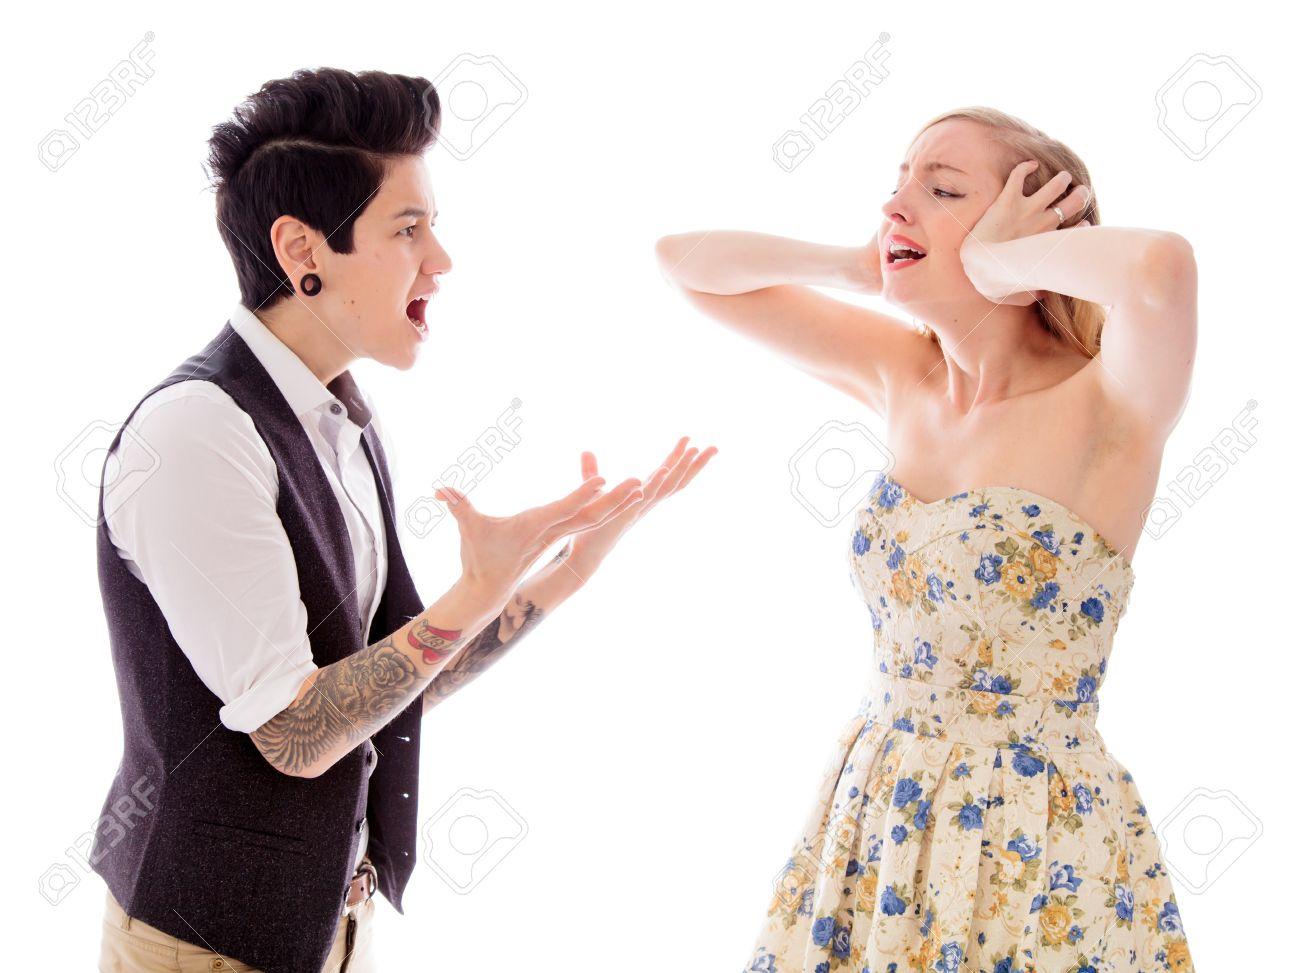 Lesbian couple fighting